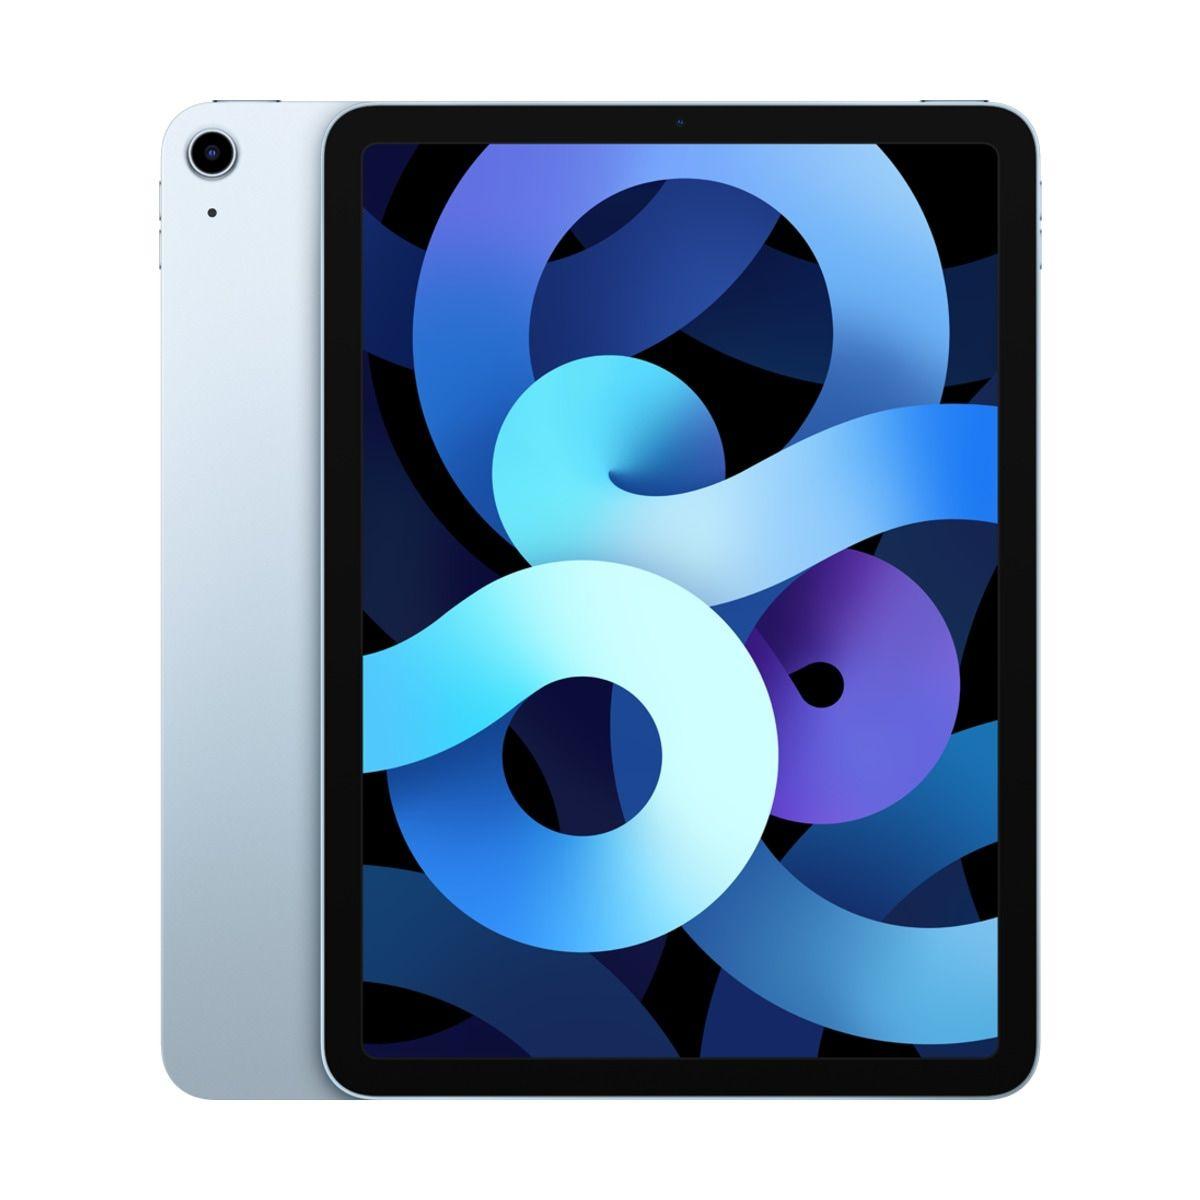 Apple iPad Air Wi-Fi+Cell 64GB - Sky Blue - MYH02FD/A